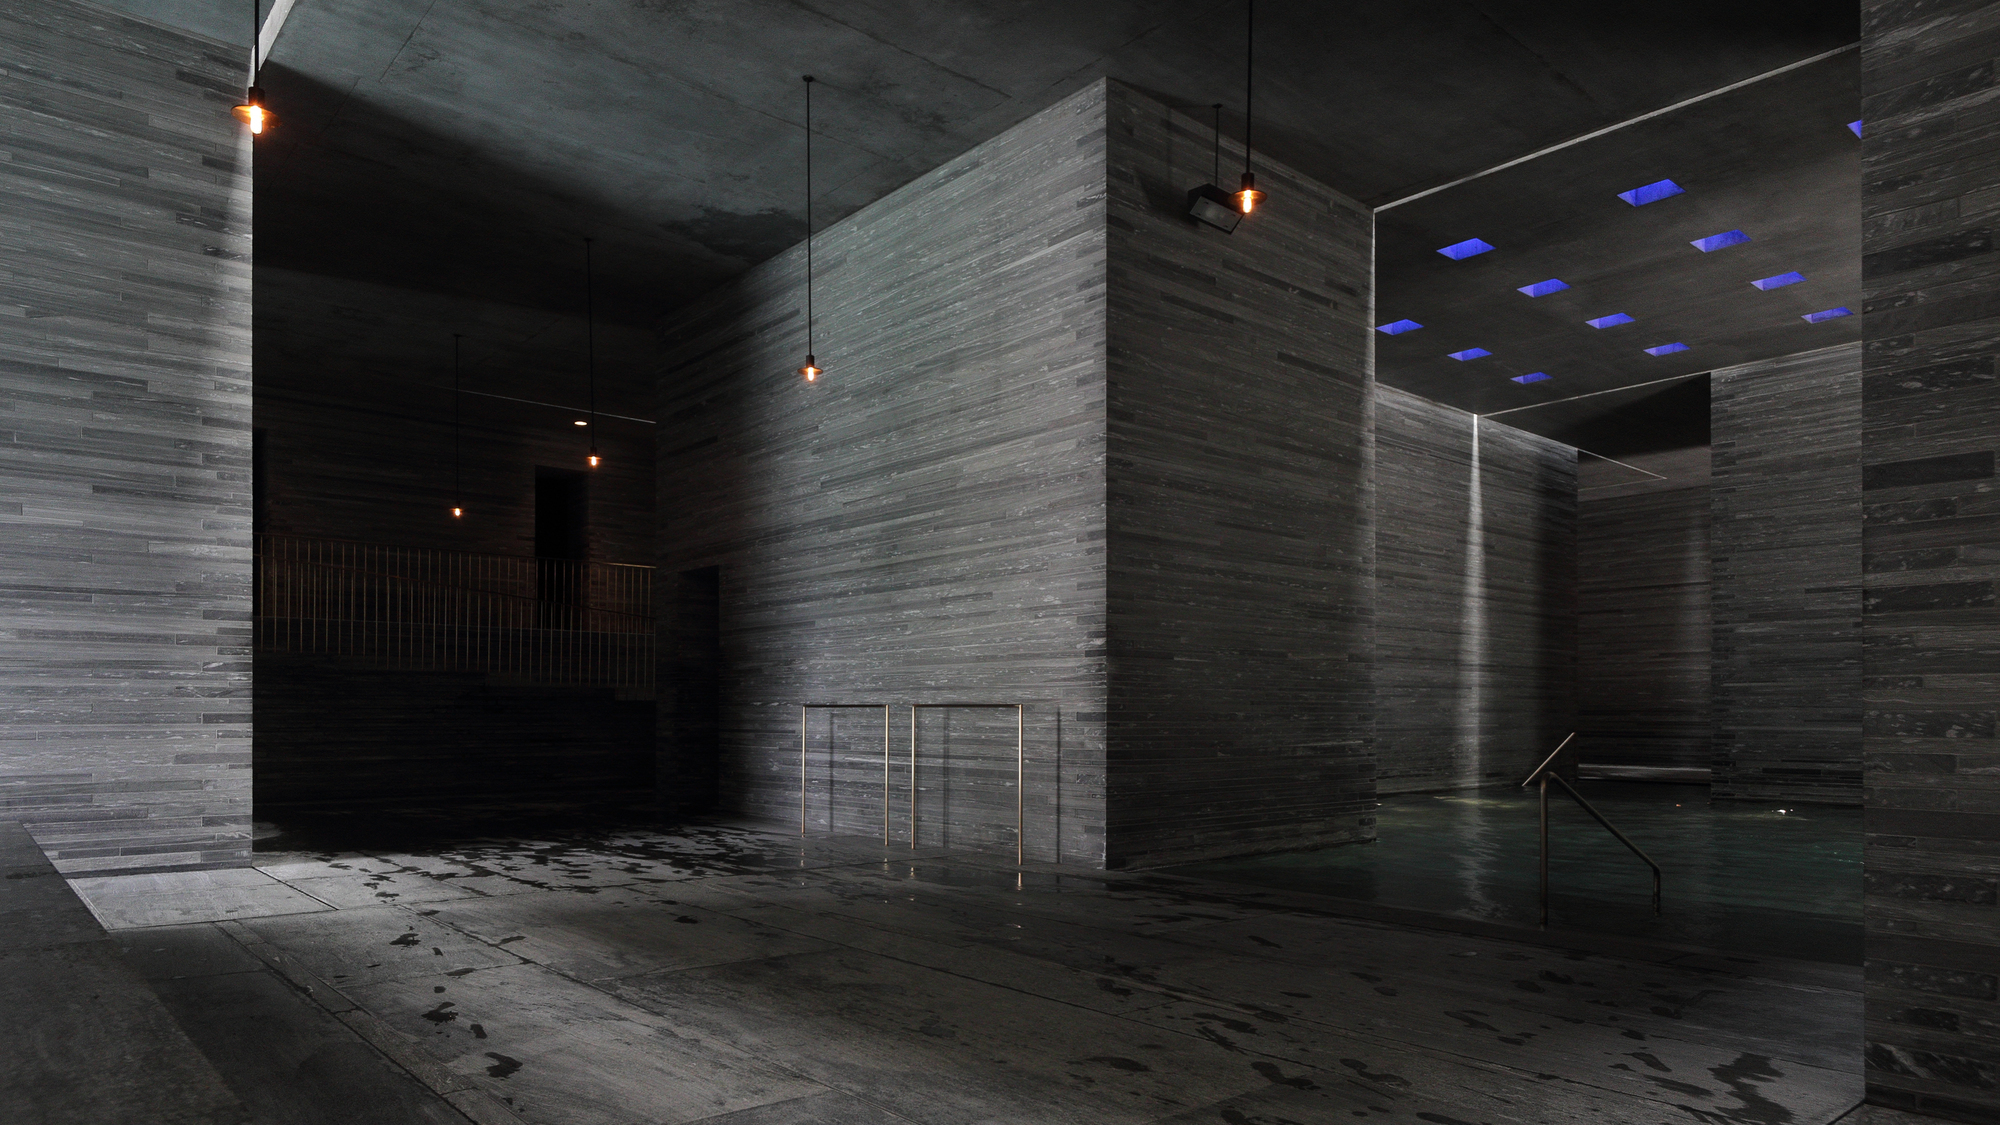 diffused light architecture - photo #37